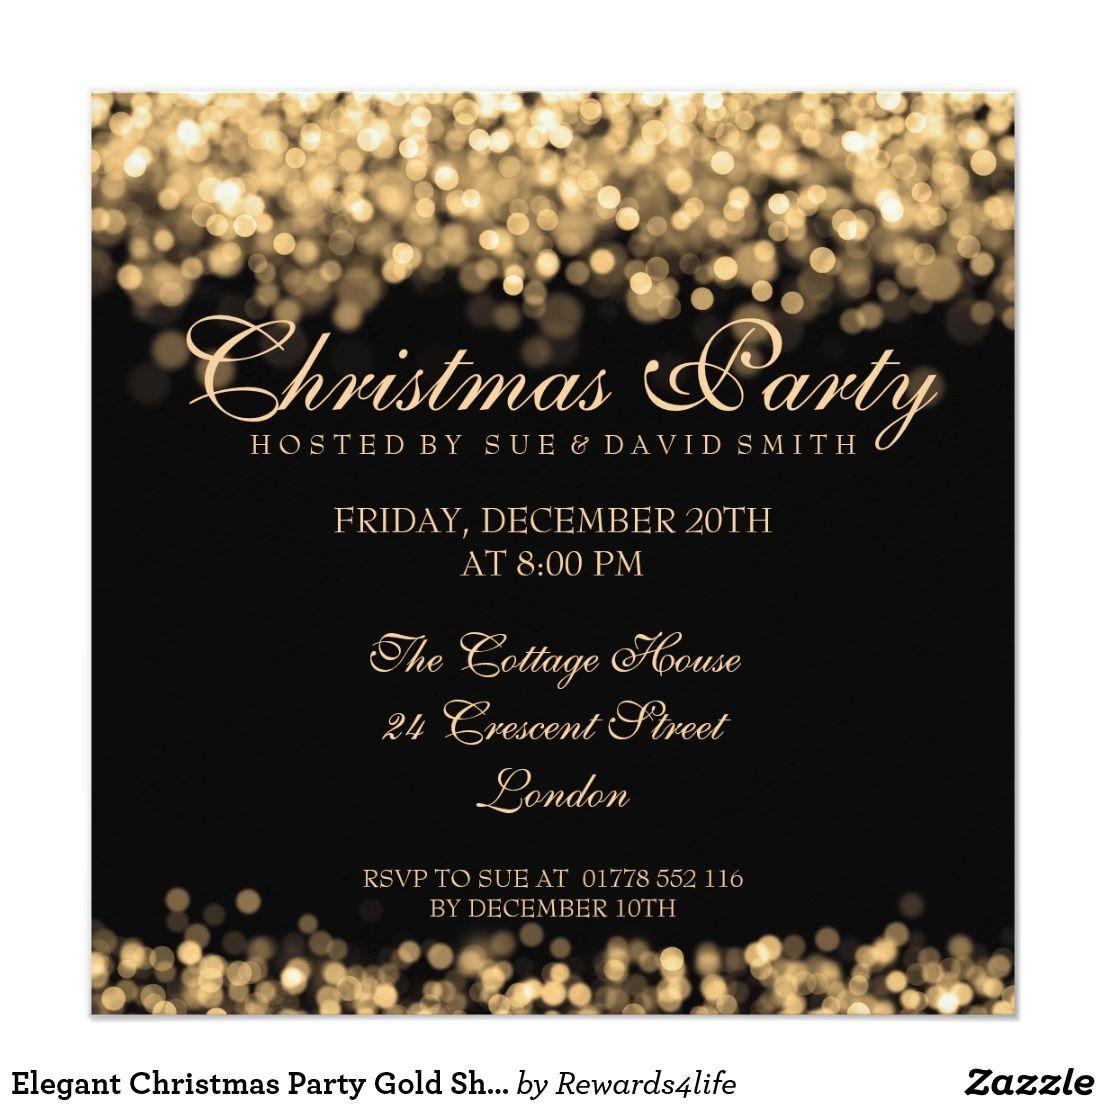 Elegant Christmas Party Gold Shimmering Lights Invitation Zazzle Com Engagement Party Wedding Elegant Christmas Party Gold Engagement Party